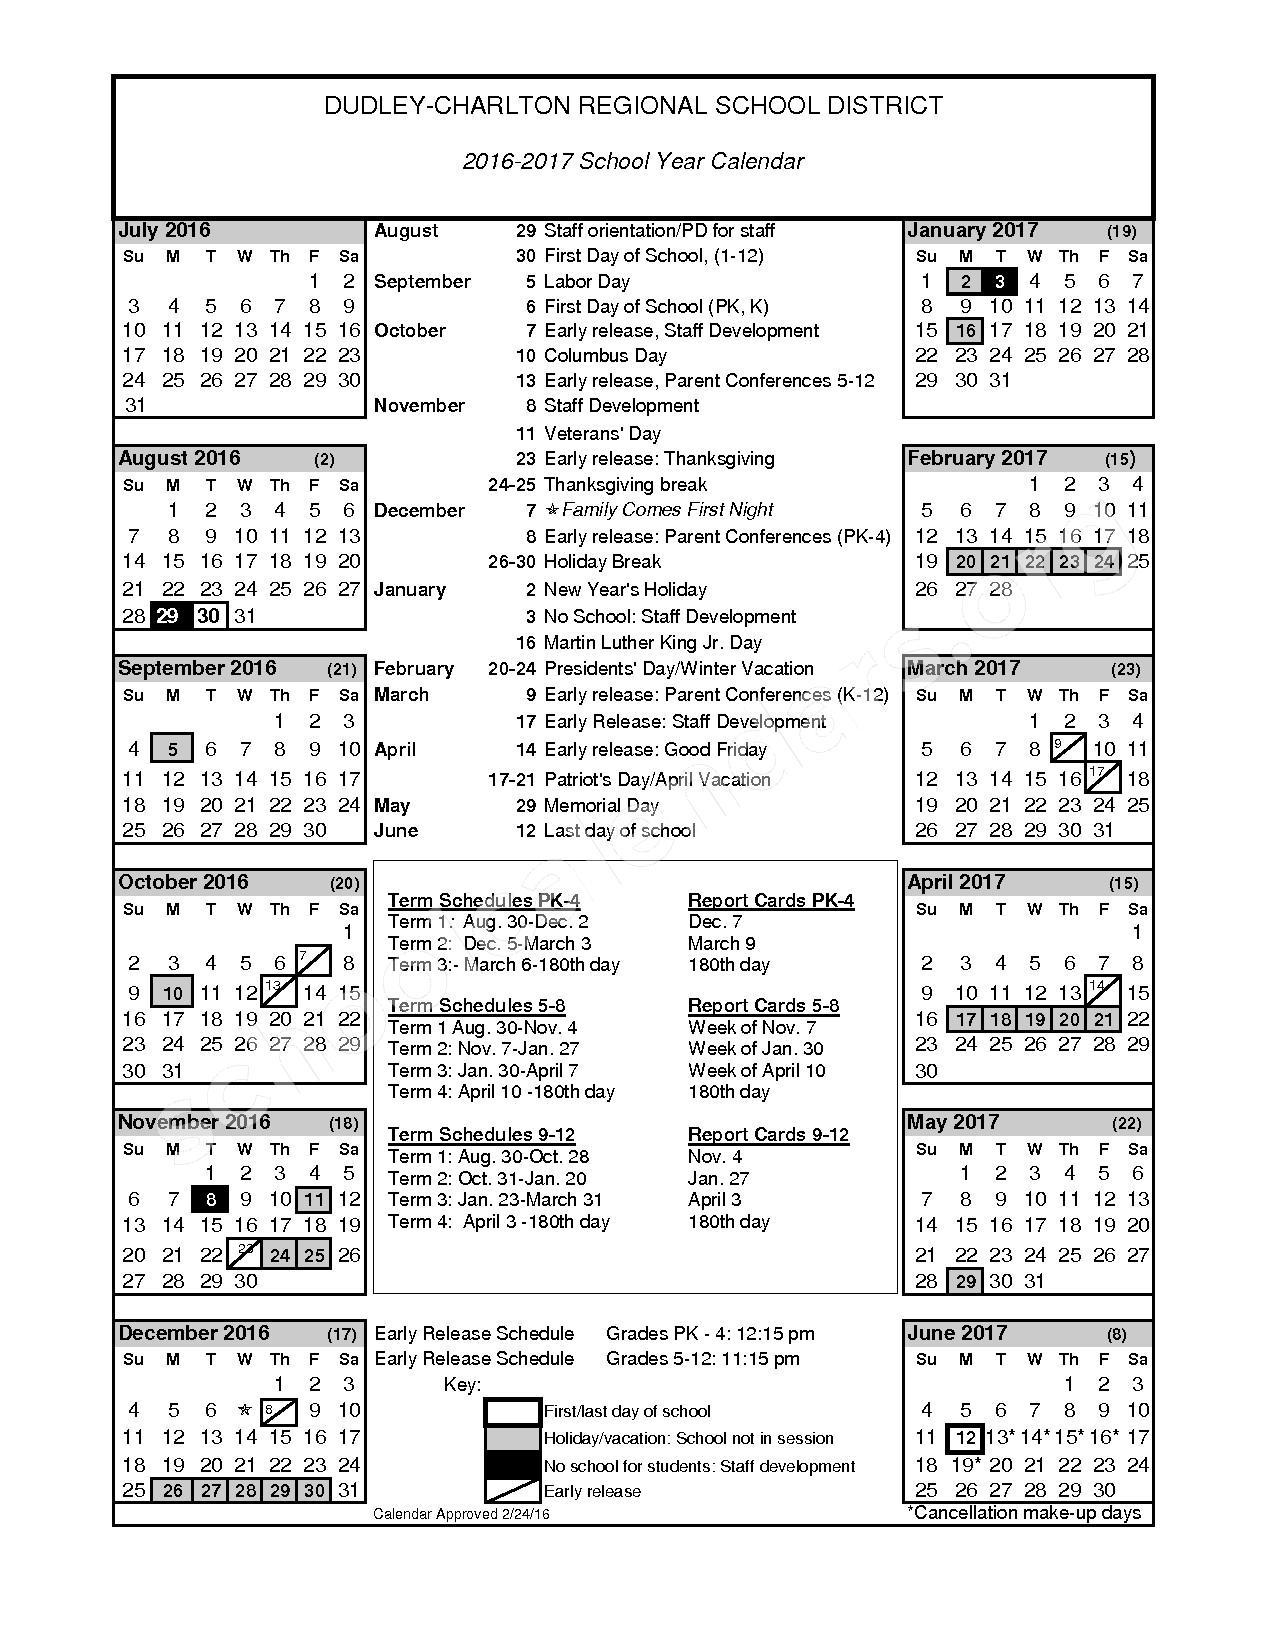 2016 - 2017 District Calendar – Dudley-Charlton Regional School District – page 1